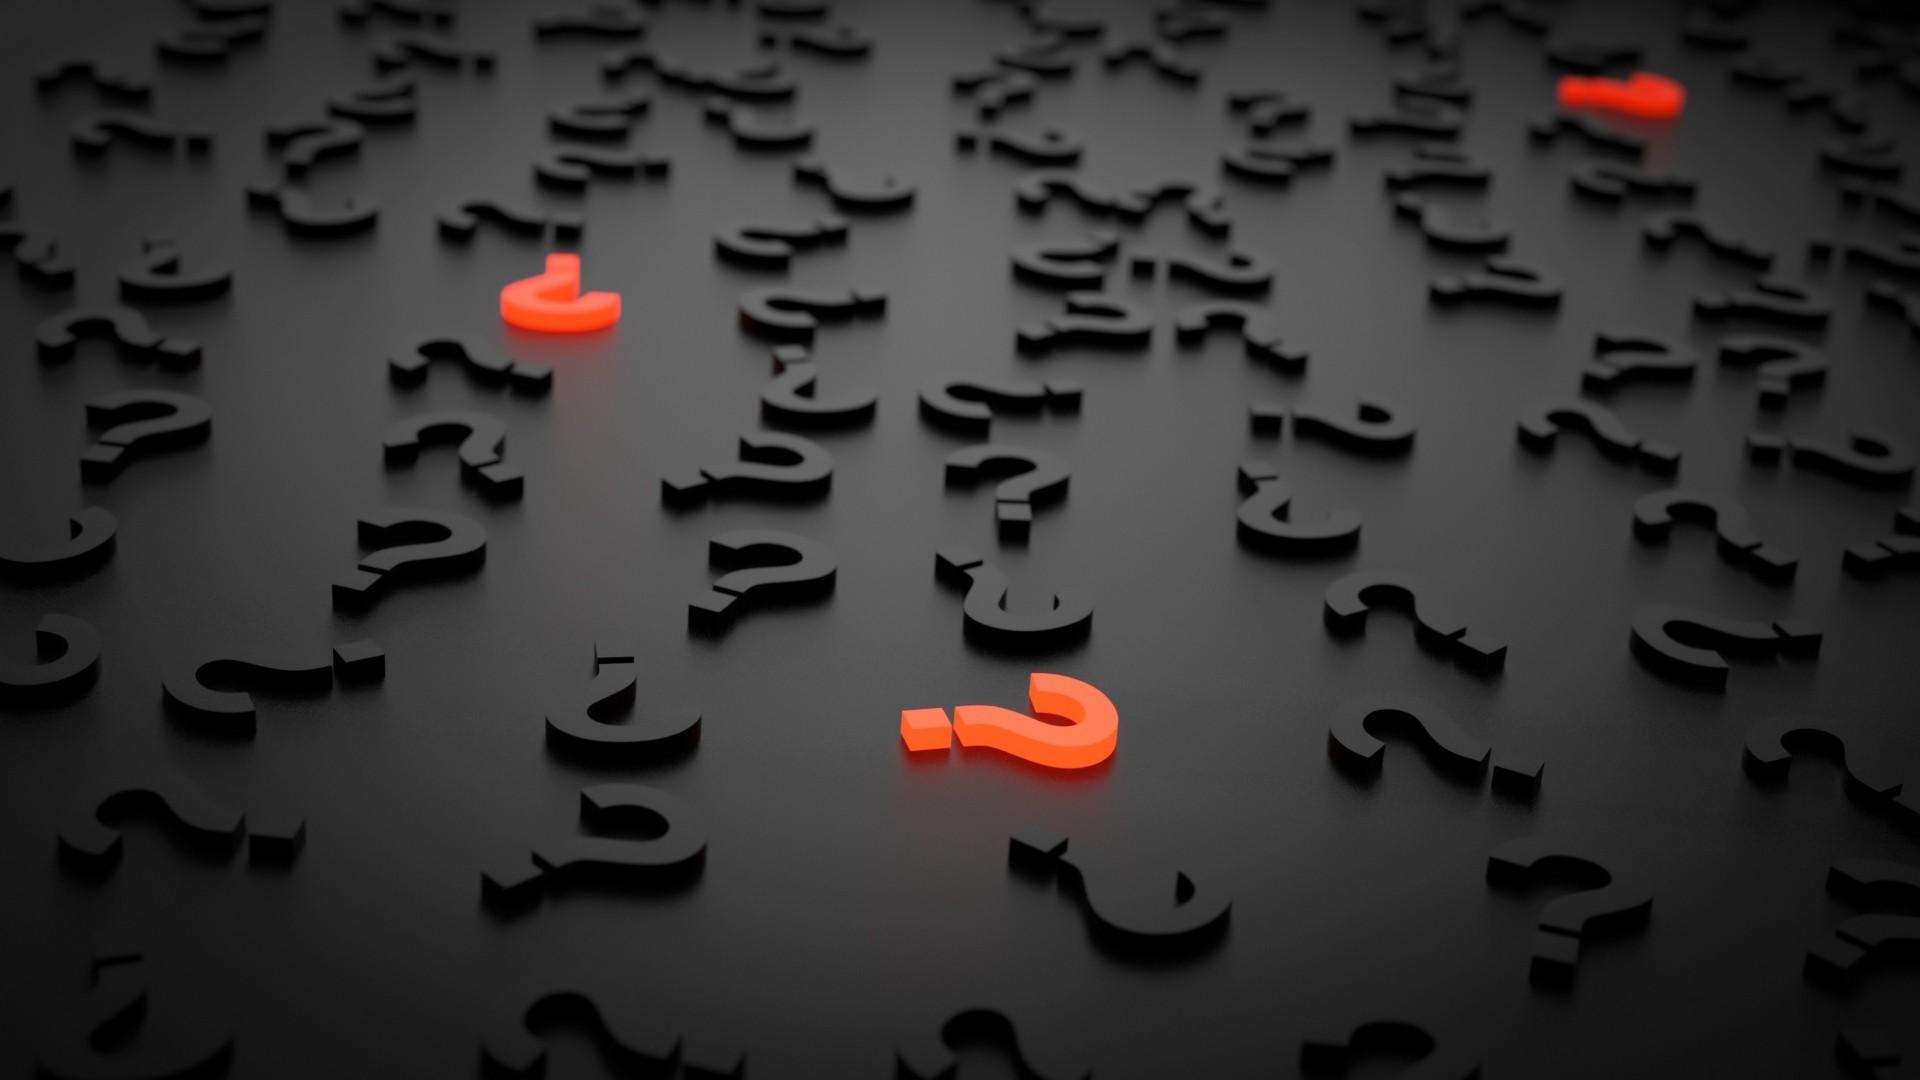 Wallpaper question marks, figures, 3d